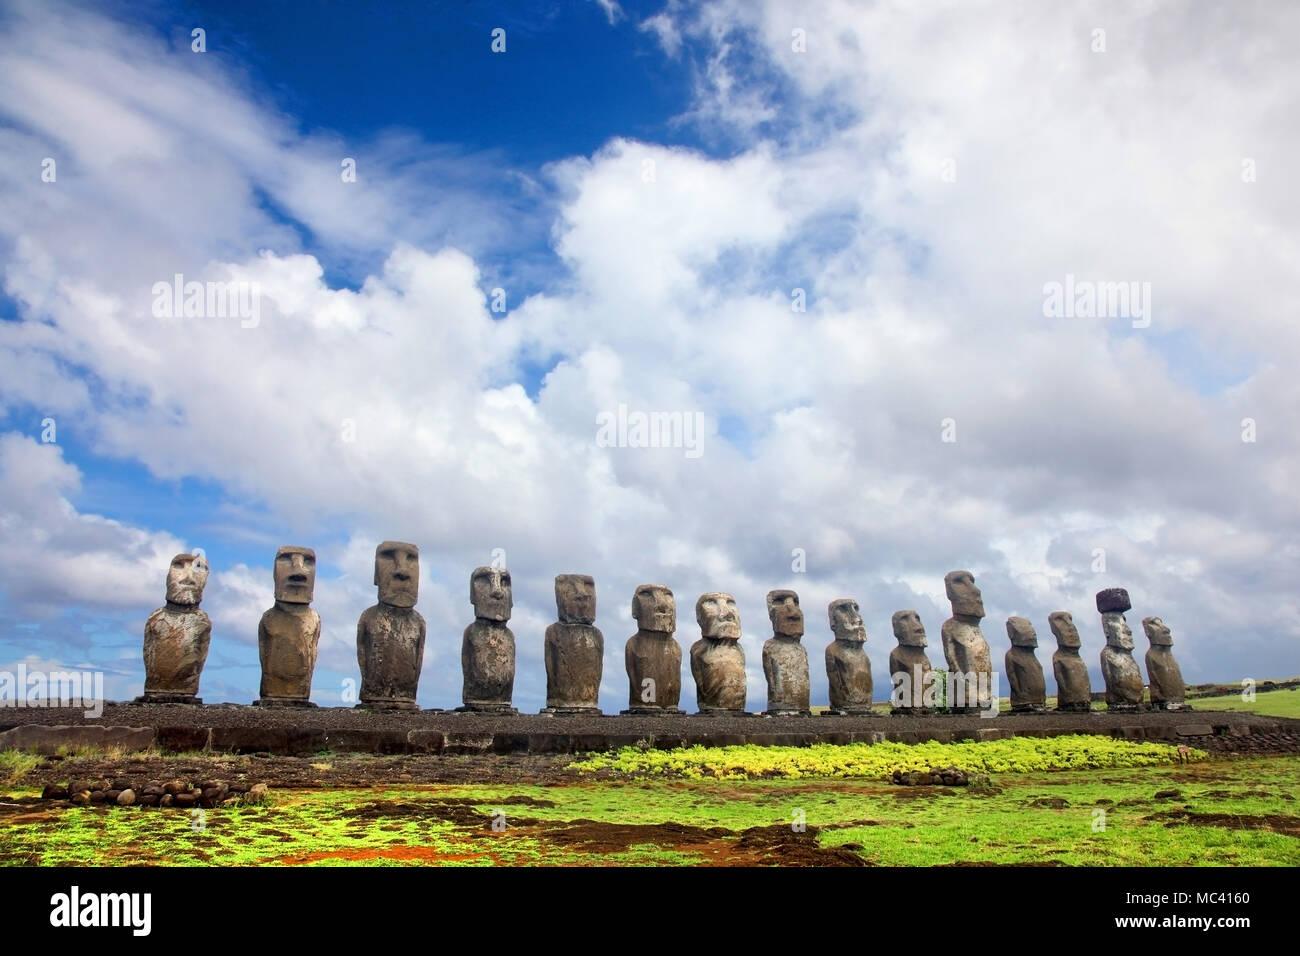 Fifteen moai standing at Ahu Tongariki, Easter Island, Chile. - Stock Image